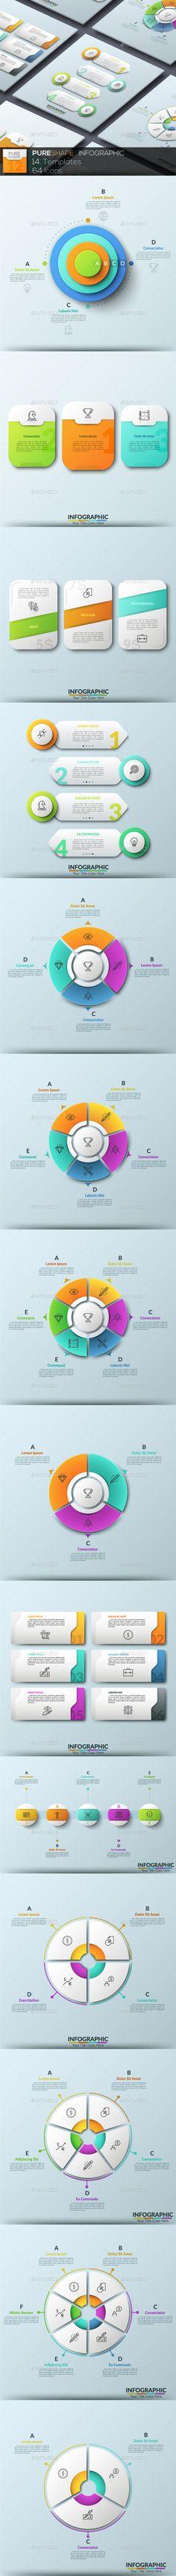 Pure Shape Infographic Templates PSD, Vector EPS, AI Illustrator